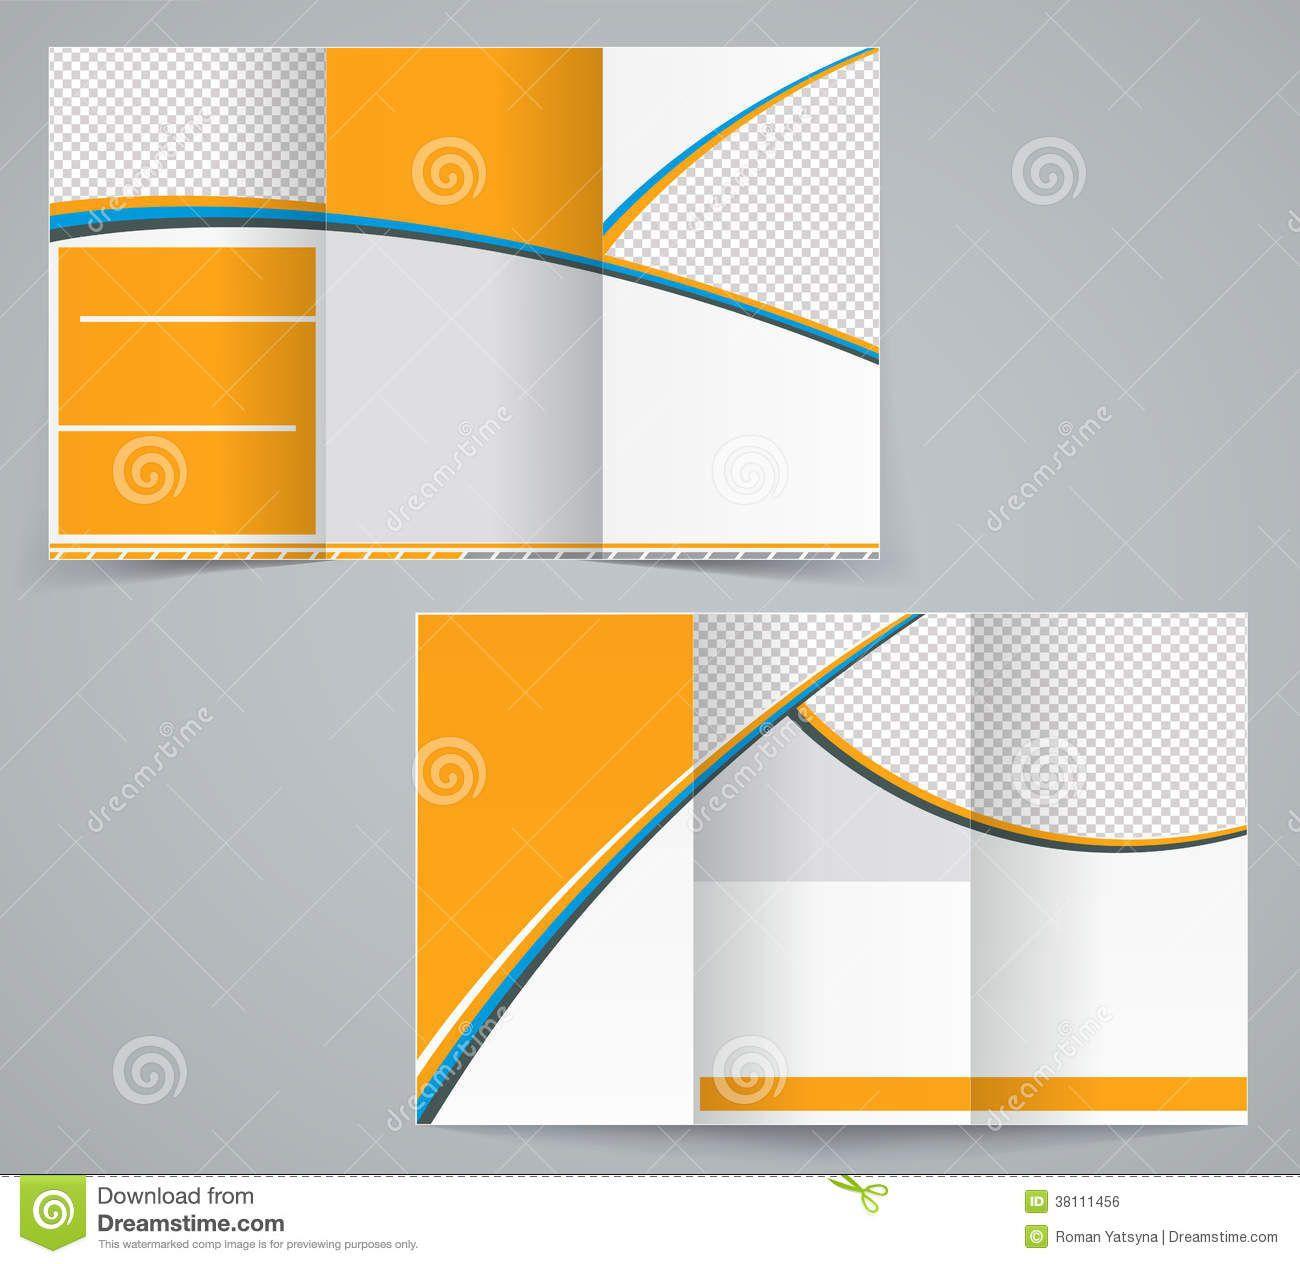 009 Stirring Tri Fold Brochure Template Free High Def  Download Photoshop M Word Tri-fold Indesign MacFull